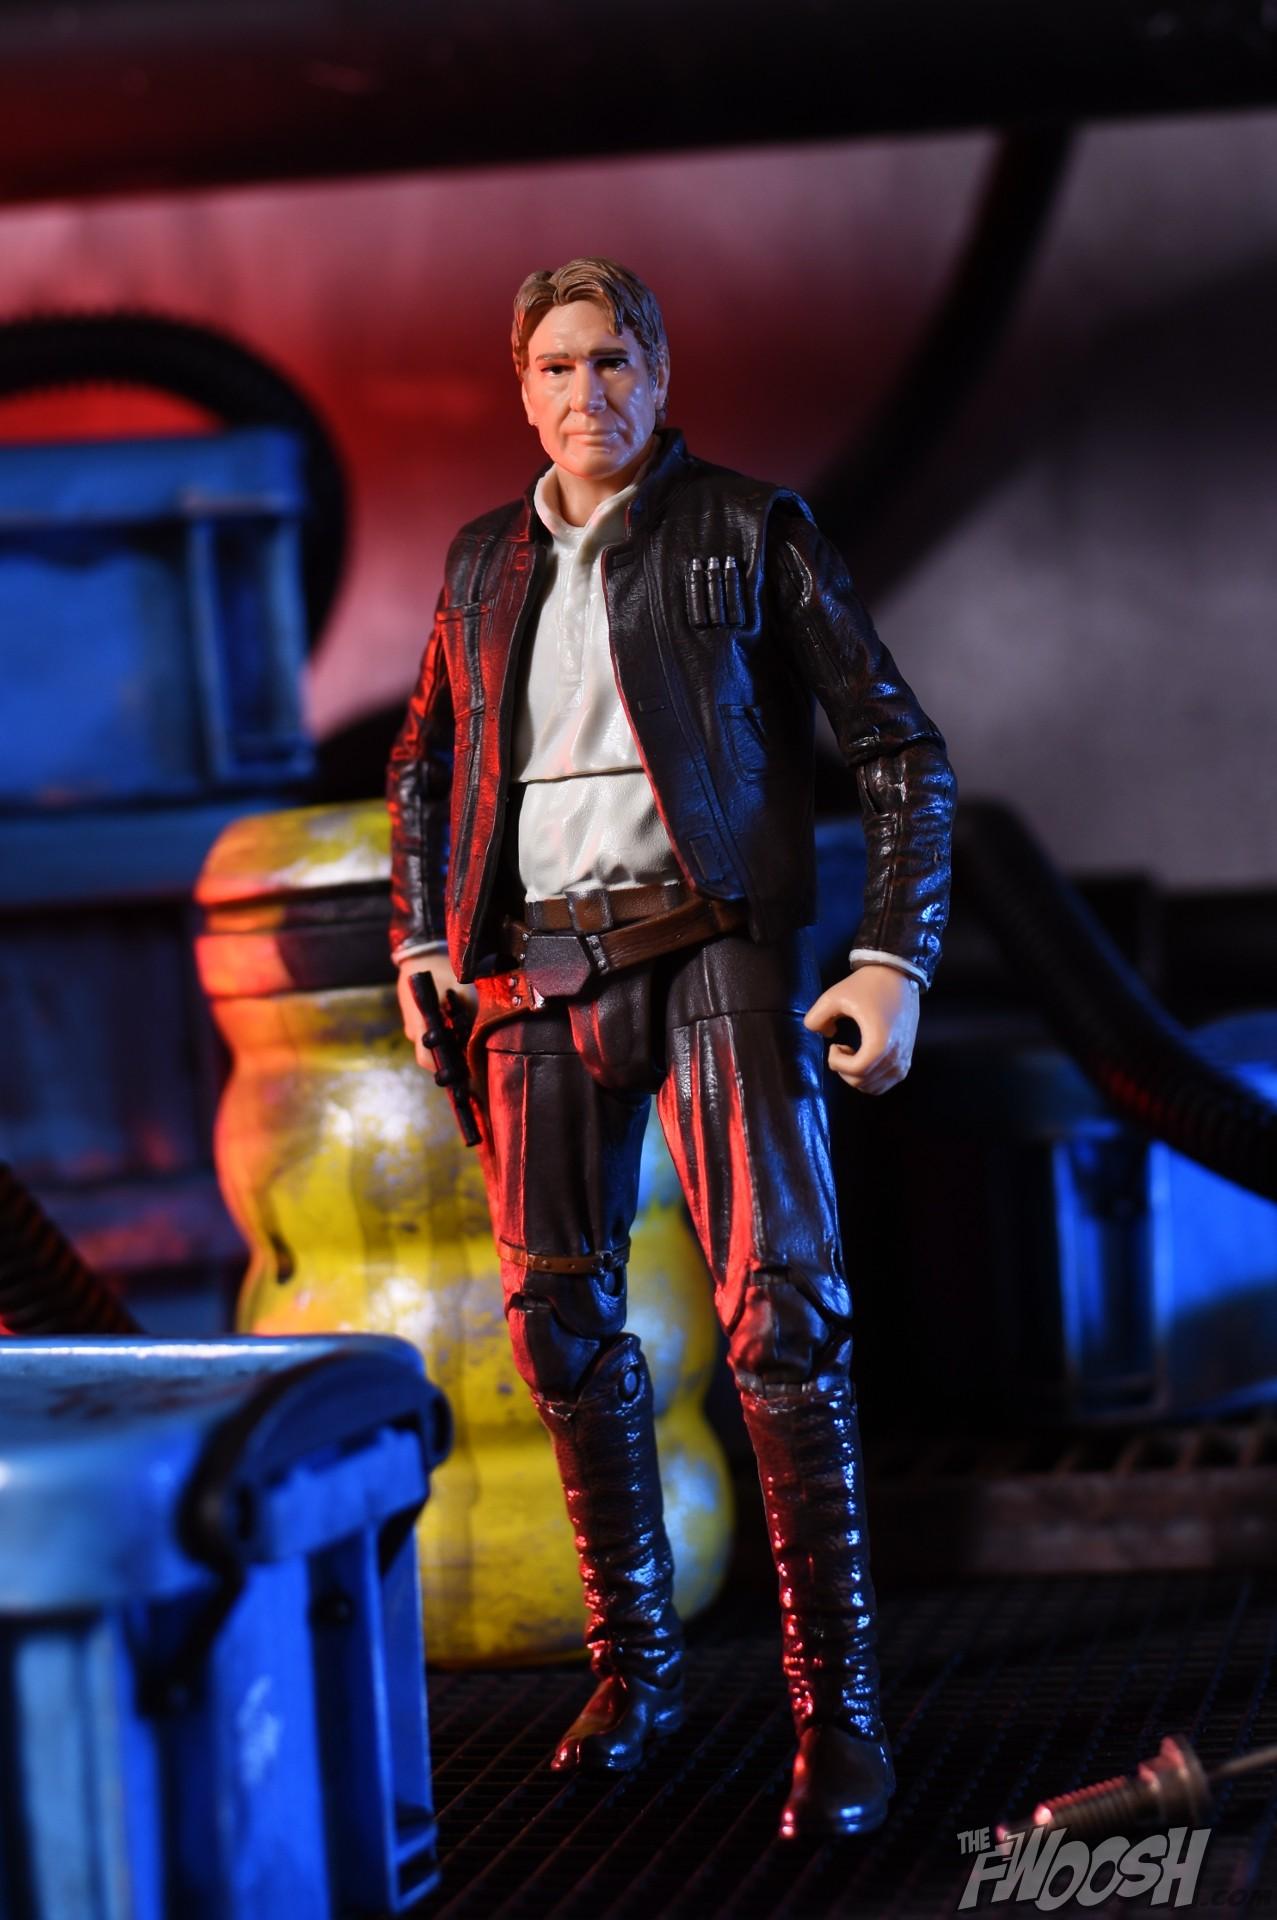 Solo: Hasbro: Star Wars Black Series The Force Awakens Han Solo